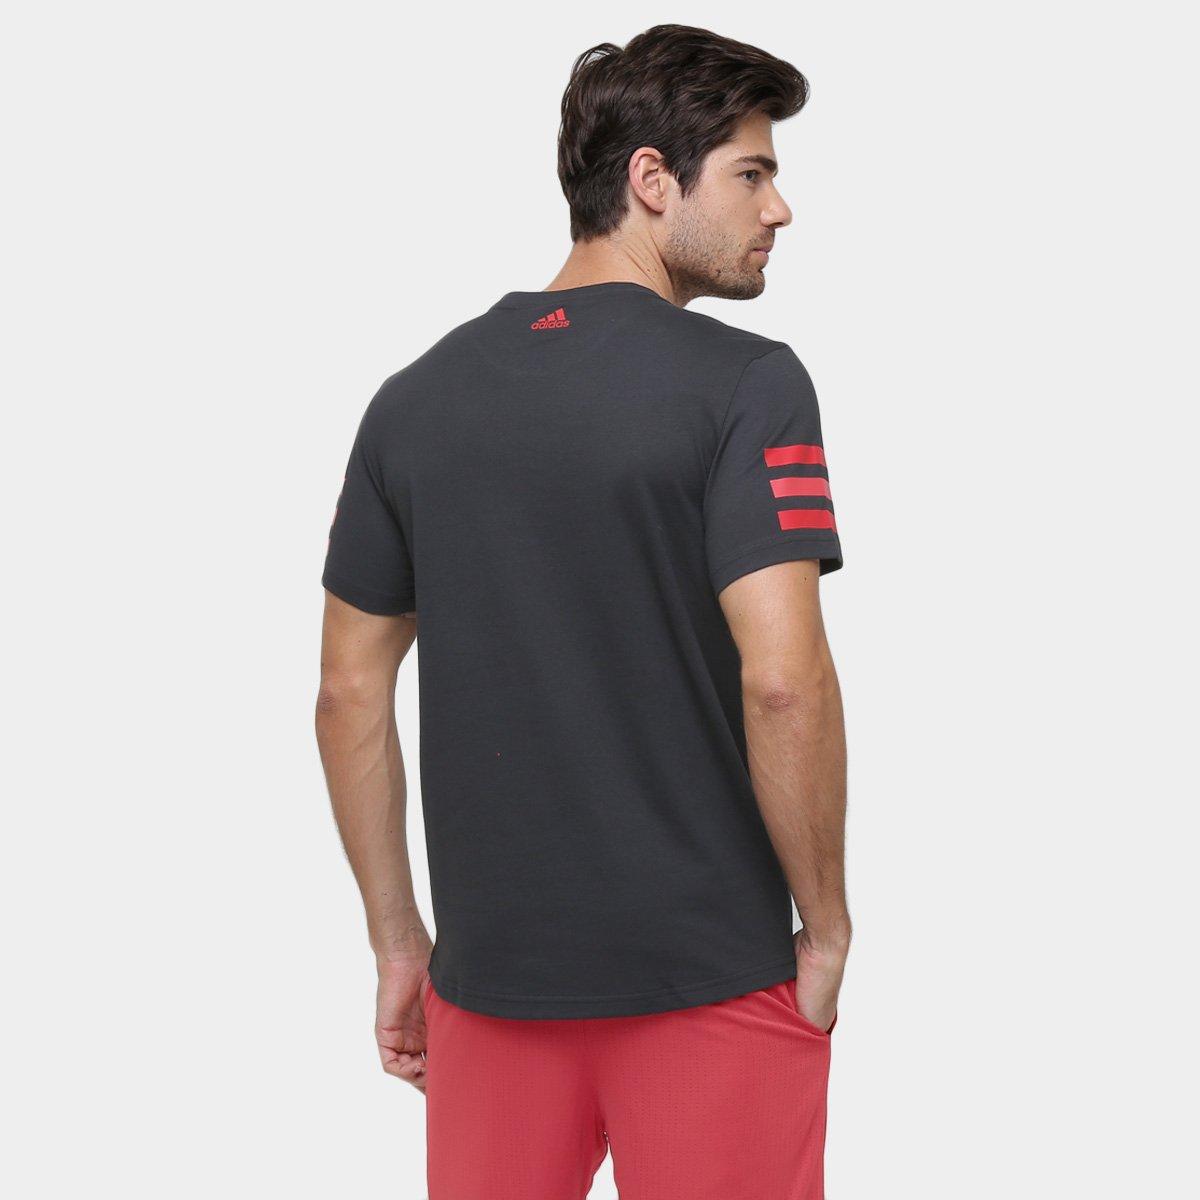 Adidas Originals Camiseta deportiva Adidas Hombre